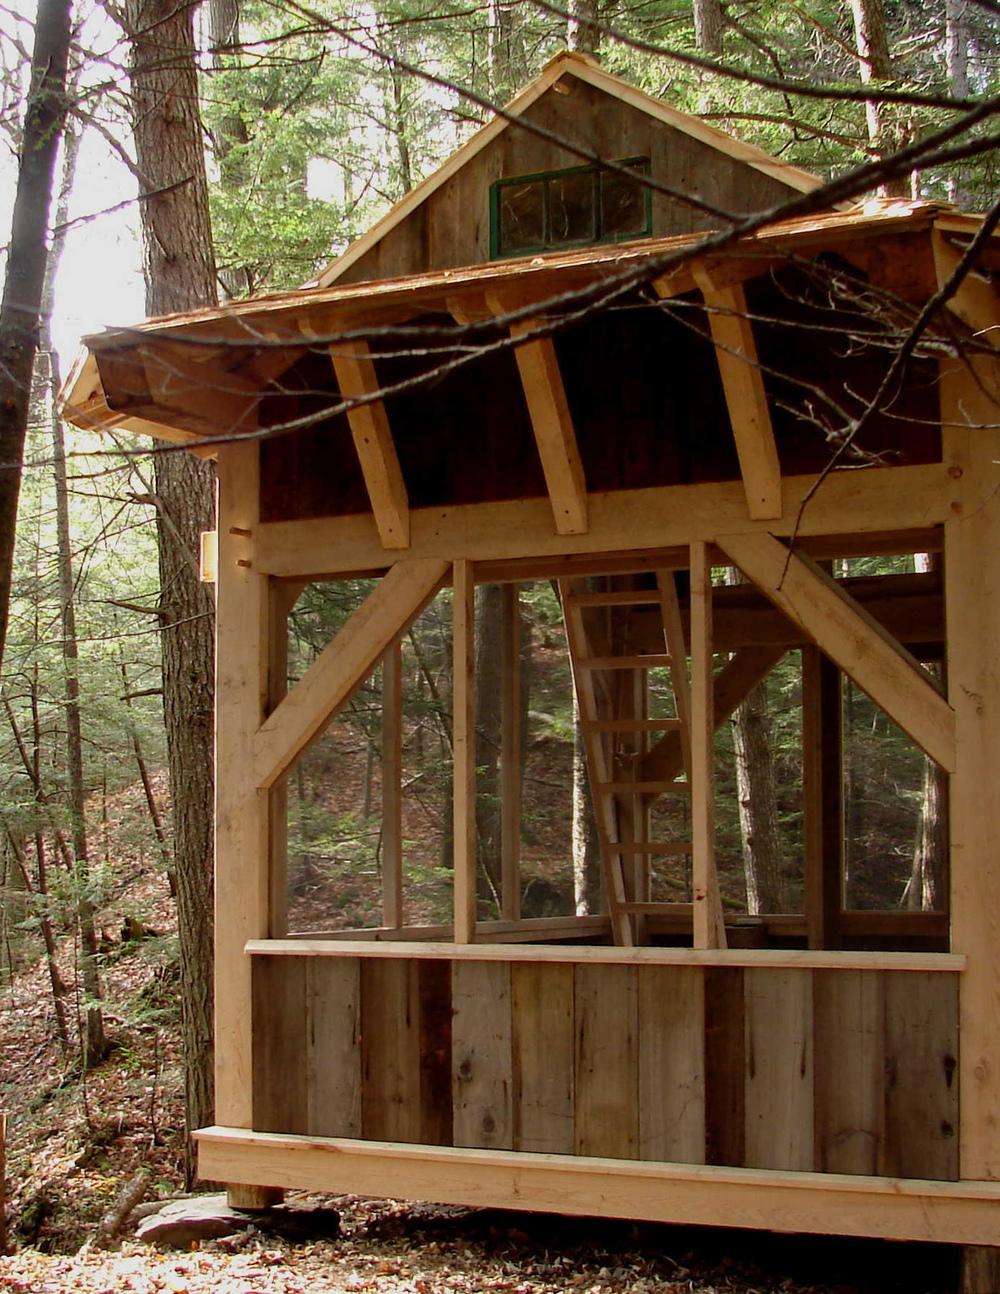 The Folly / Pam's Cabin